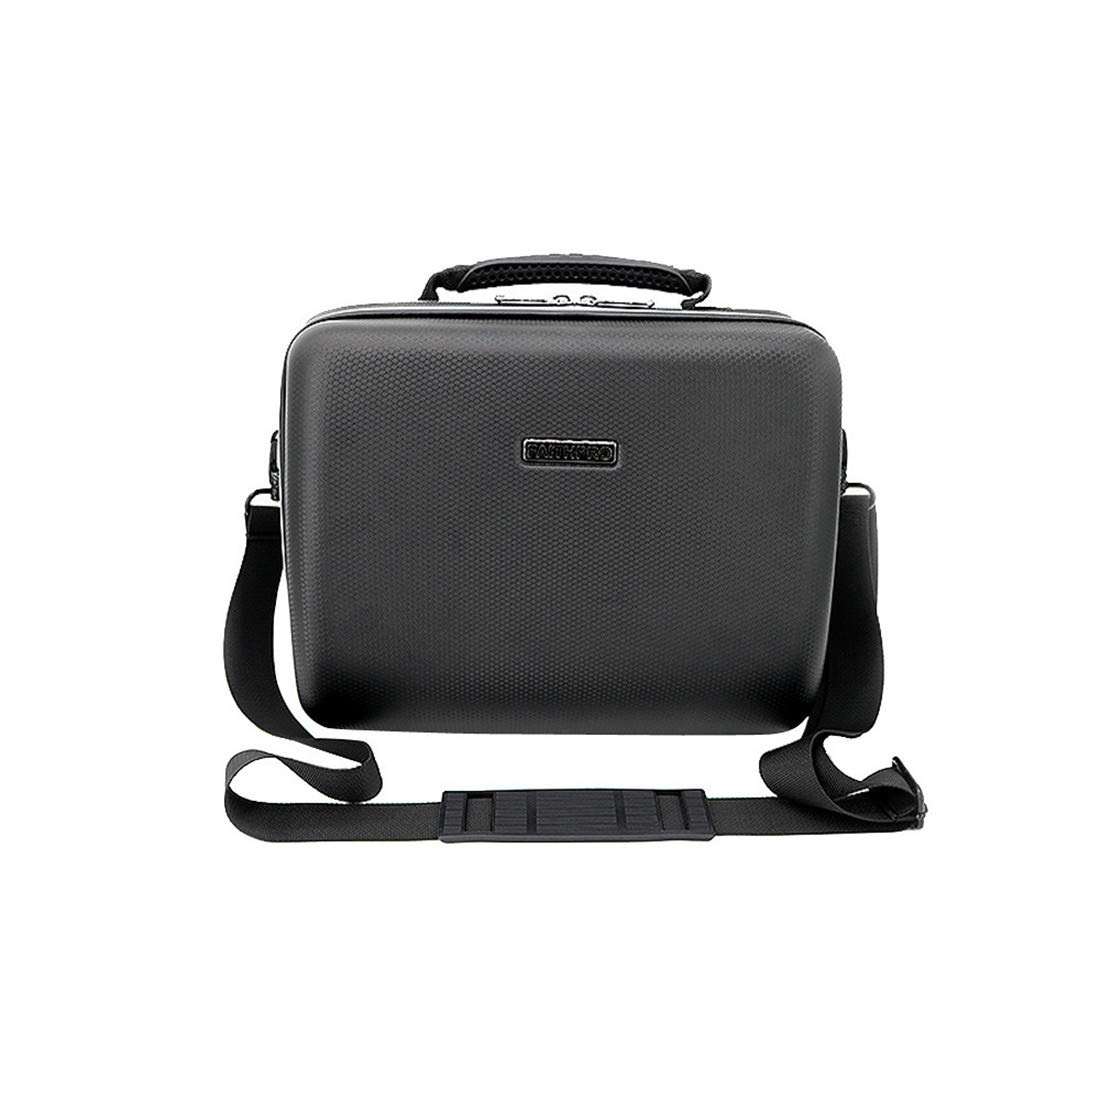 Replacement Portable Shoulder Bag Portable Case Pouch for DJI Mavic 2 PRO//Zoom